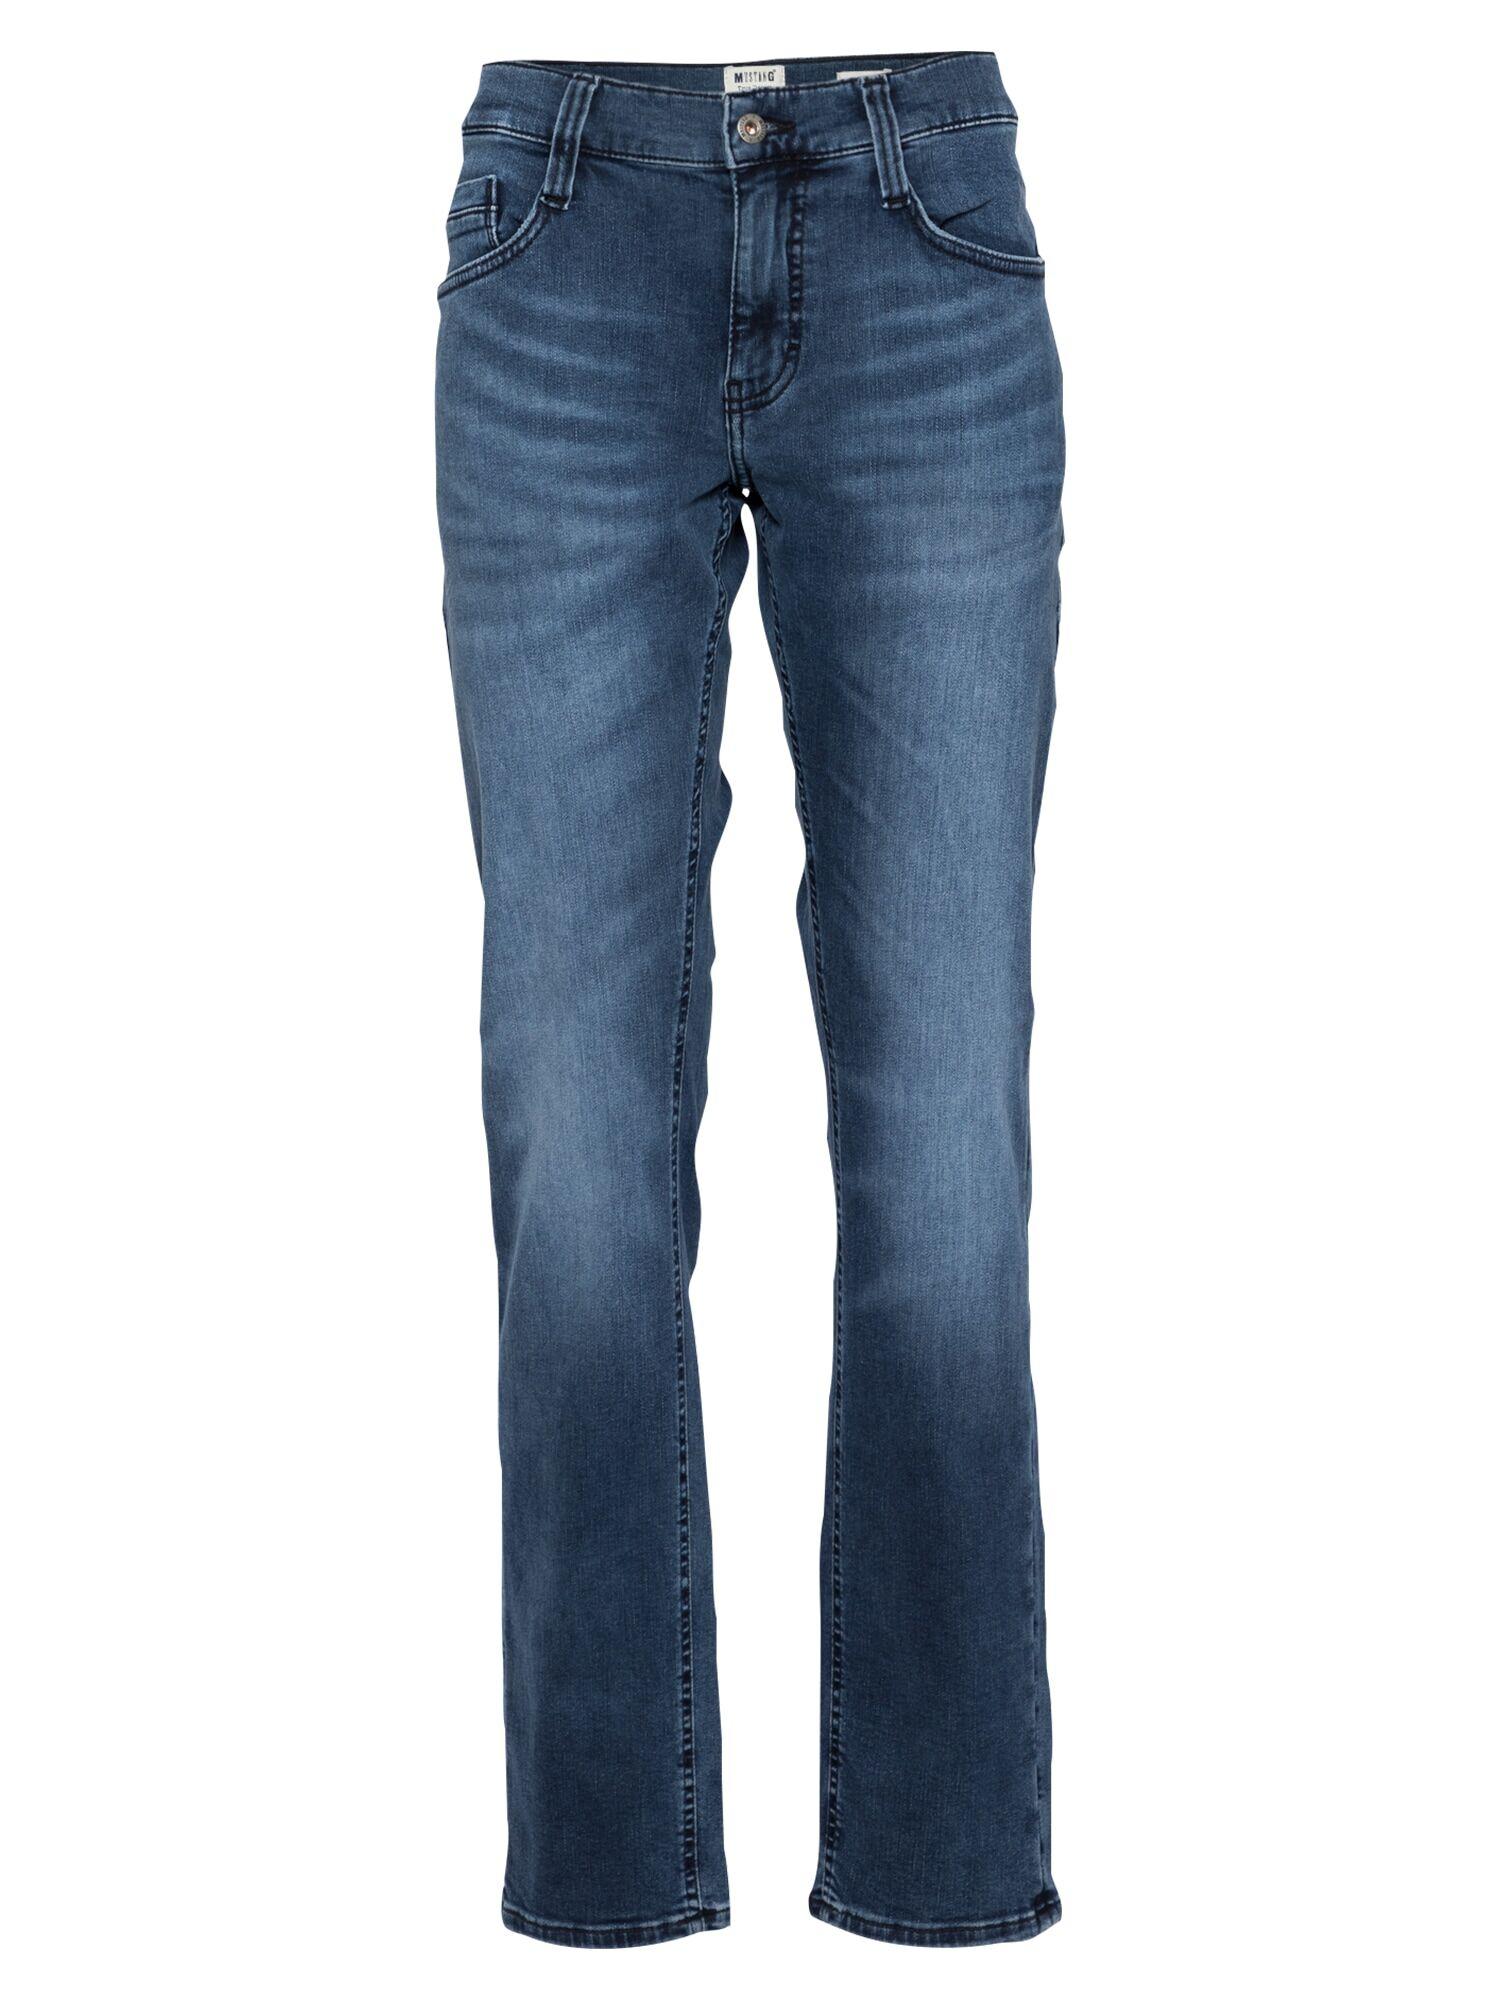 MUSTANG Jean 'Oregon'  - Bleu - Taille: 32/32 - male